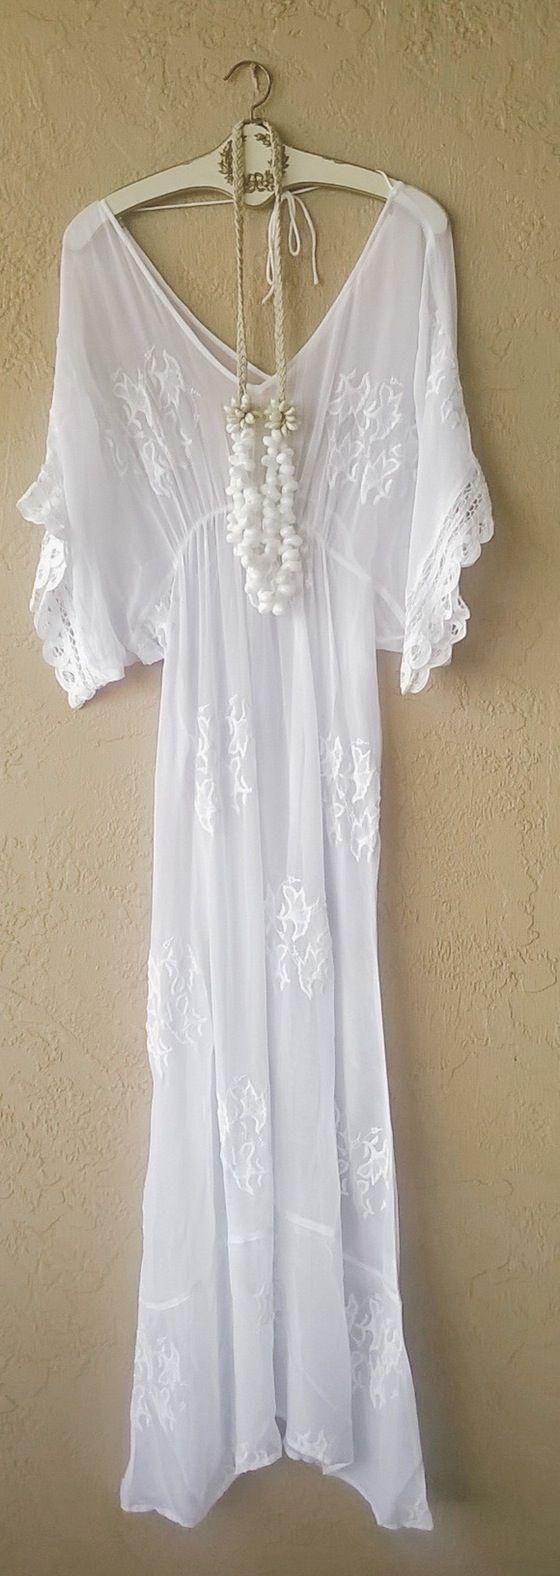 Image of sixty days magic romantic bohemian gypsy lace wedding dress